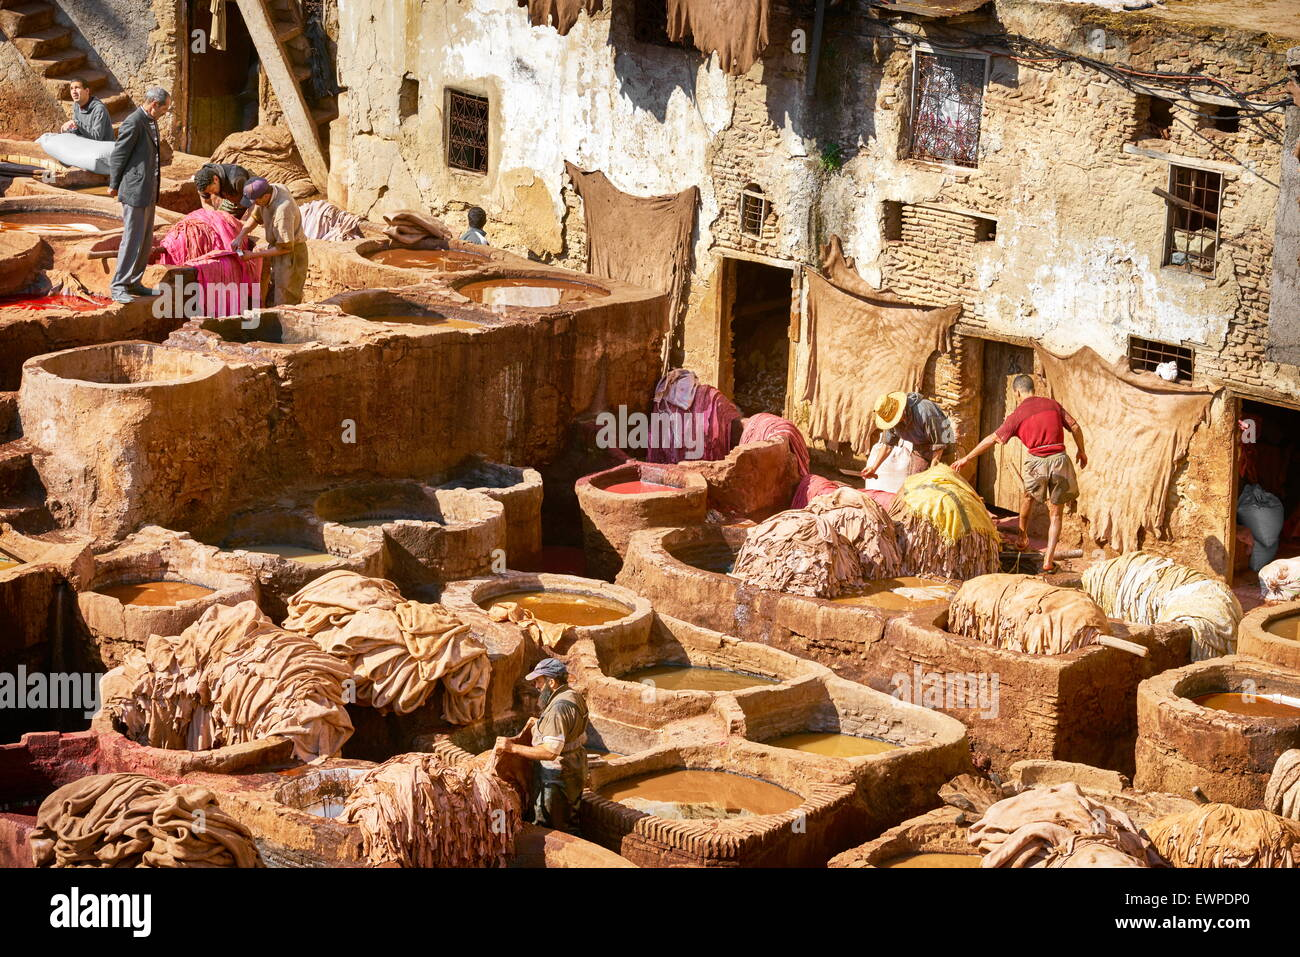 Traditional leather Chouwara Tannery, Fez medina, Morocco, Africa - Stock Image